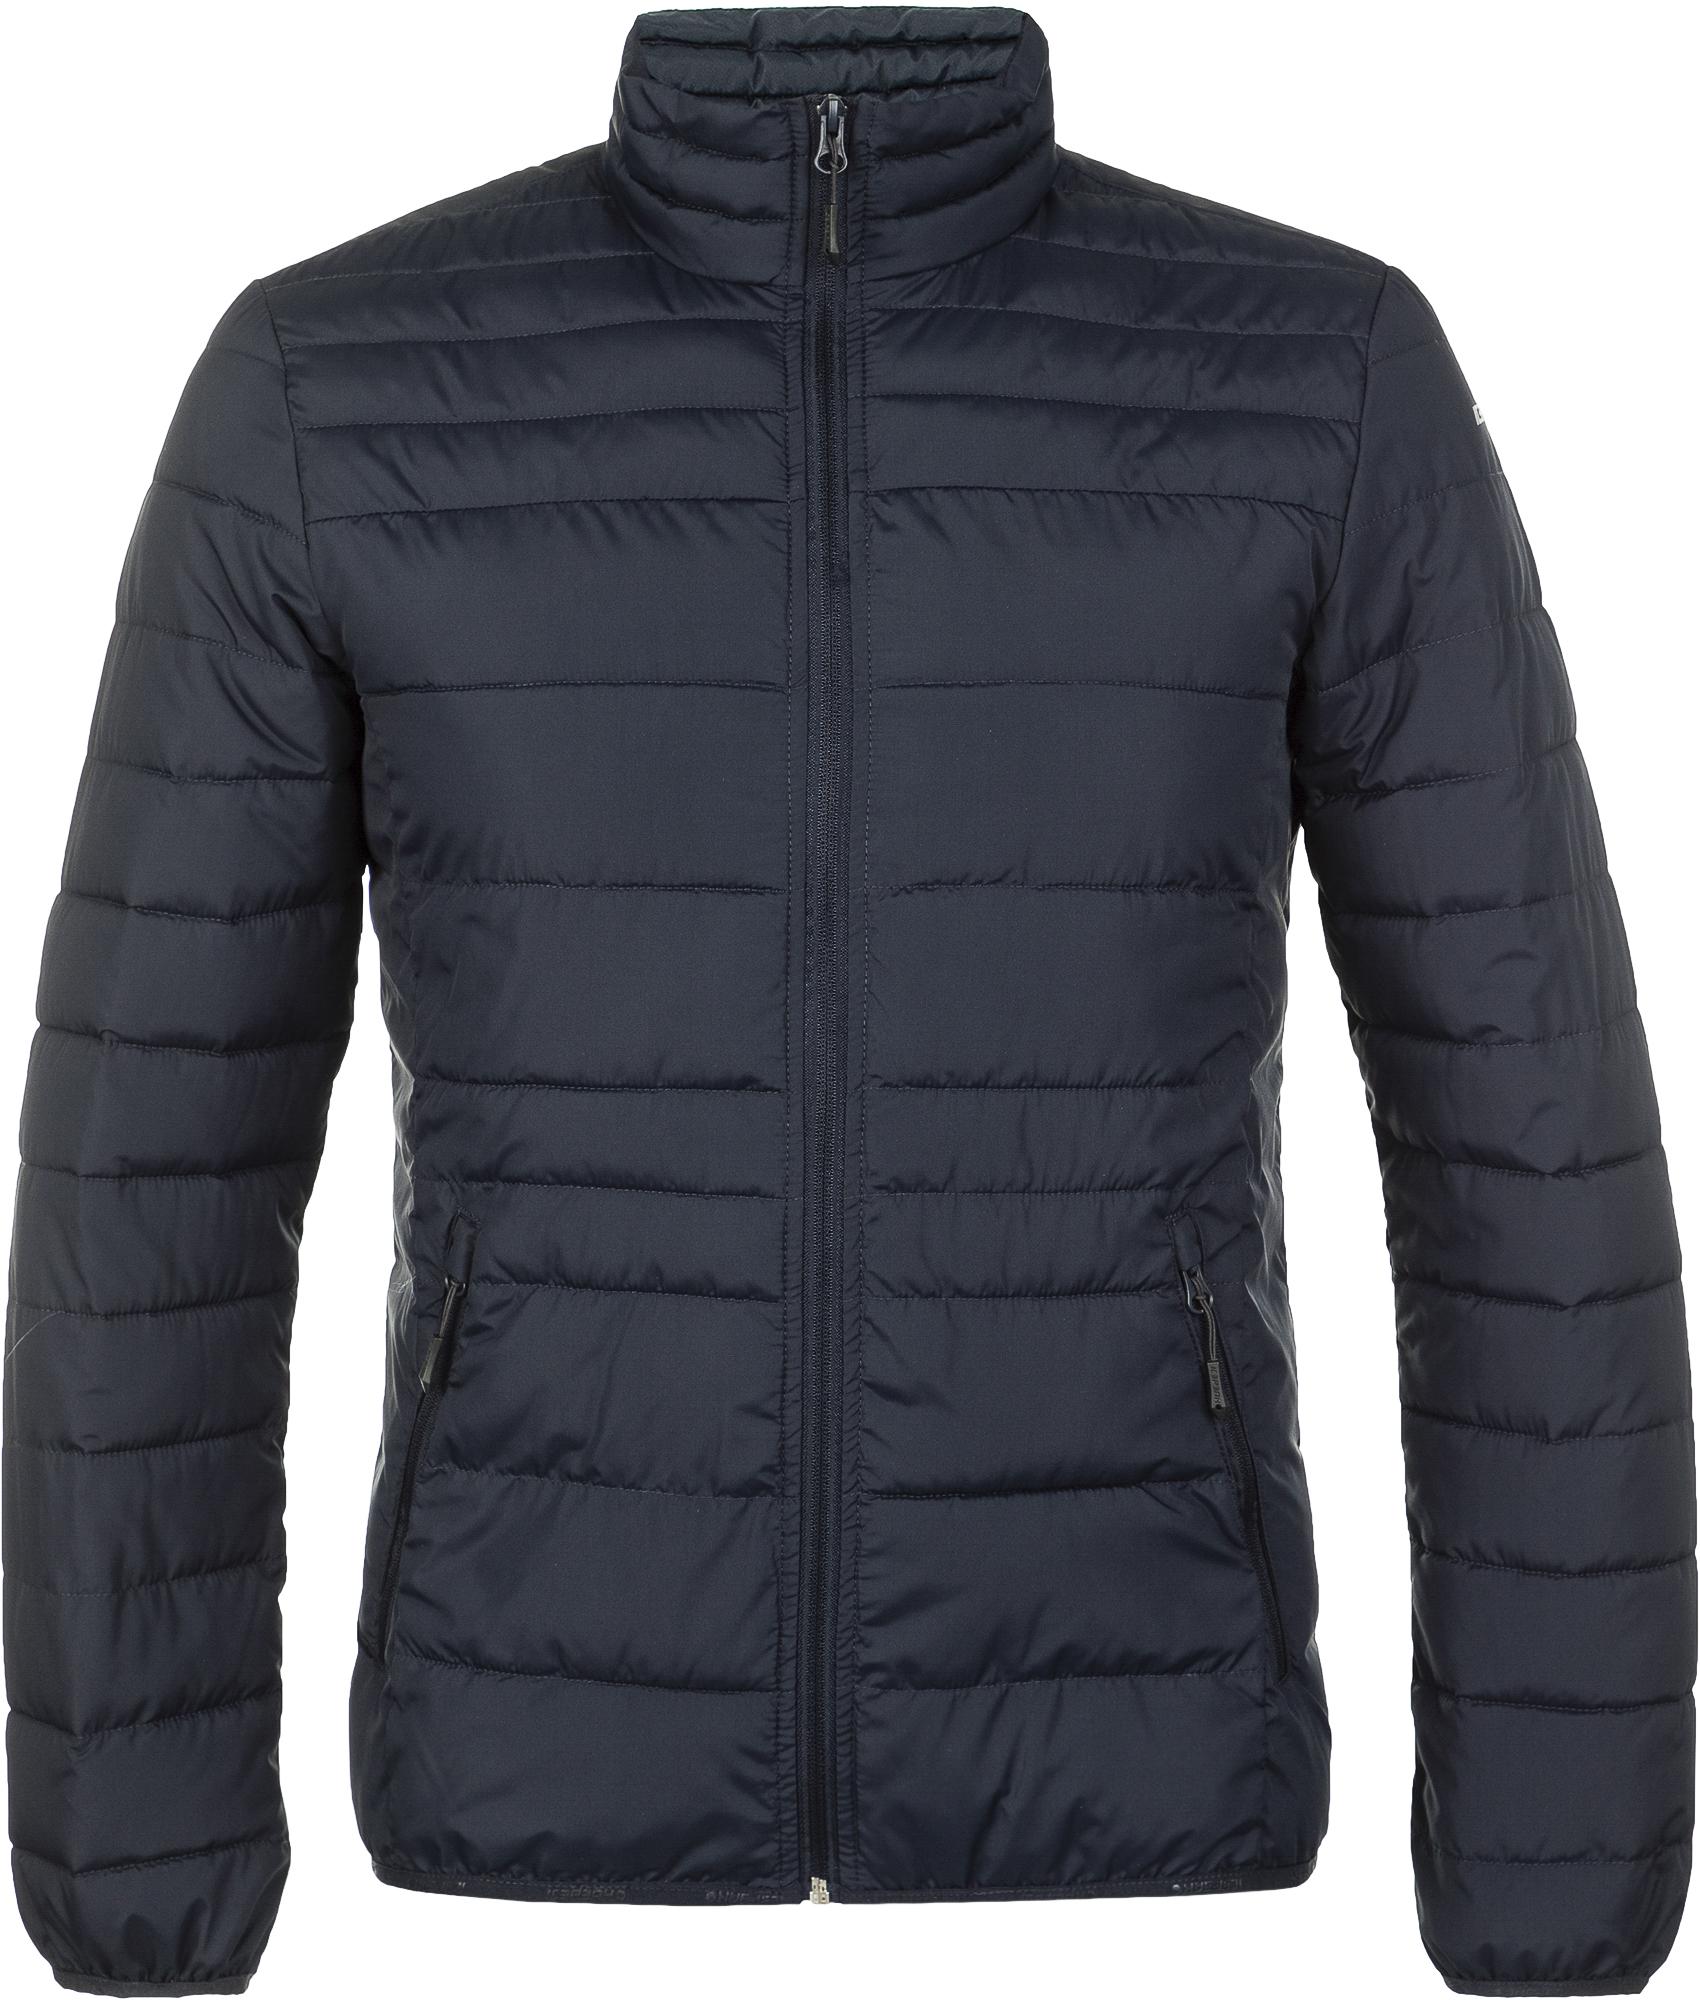 IcePeak Куртка утепленная мужская IcePeak Vannes, размер 54 цена 2017